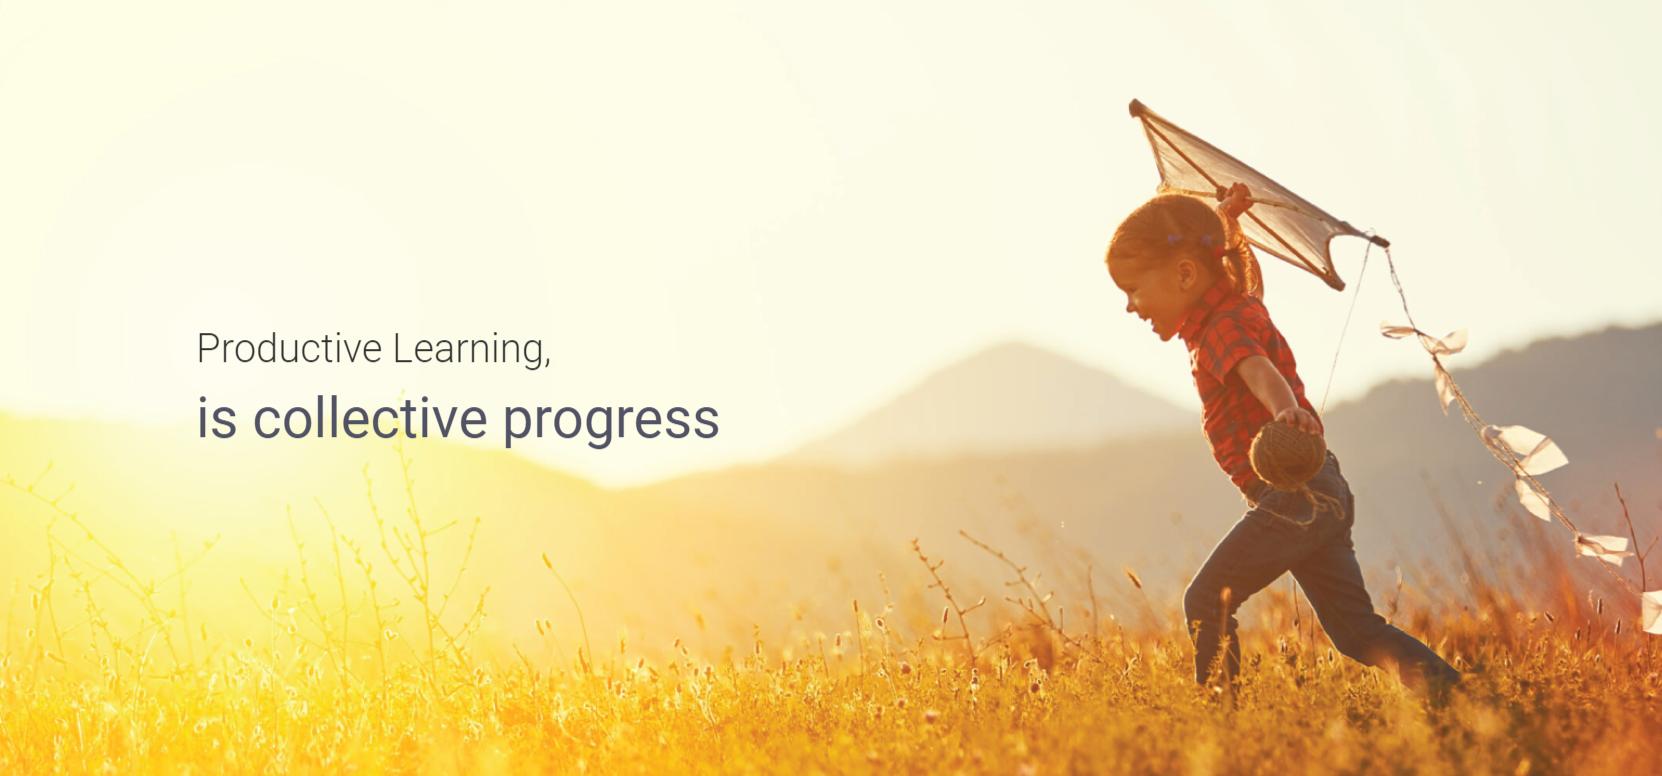 Productive Learning for the Collective Progress / Aprendizaje Productivo para El Progreso Colectivo